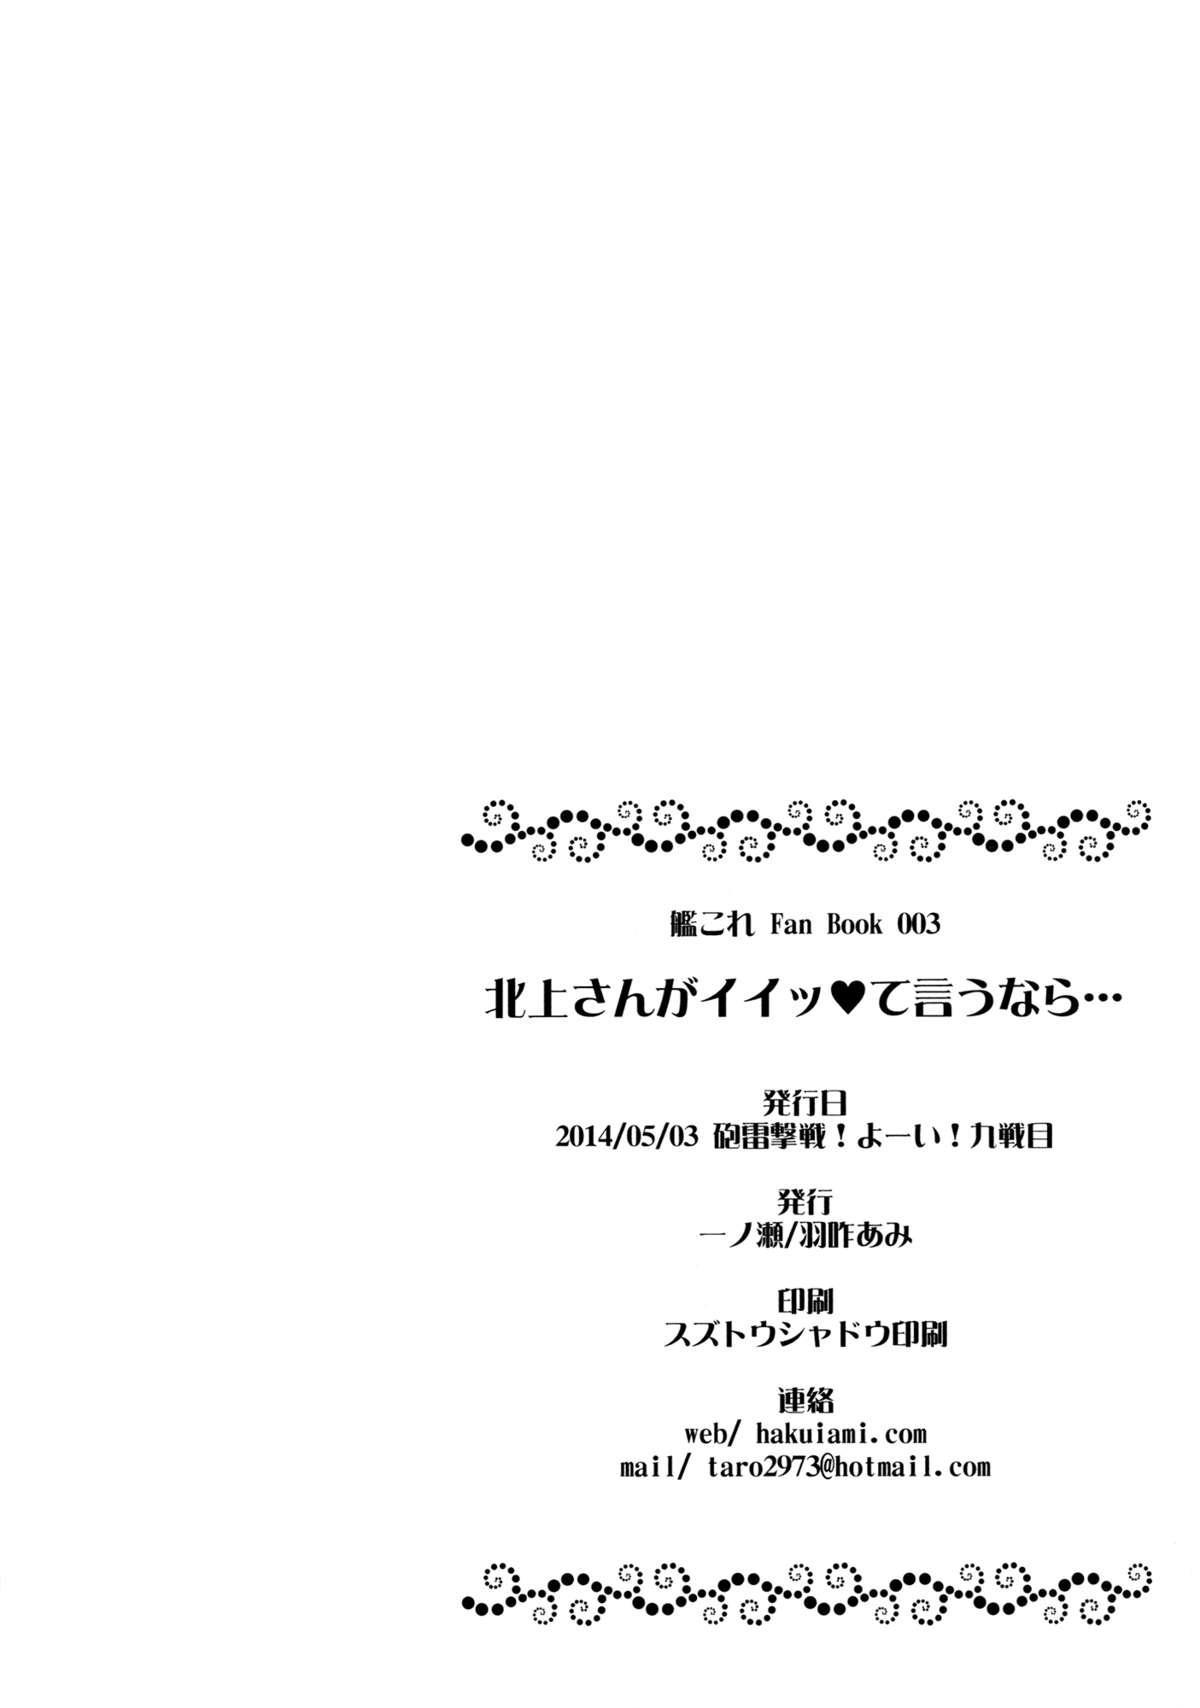 (Houraigekisen! Yo-i! 9Senme!) [Ichinose (Hakui Ami)] Kitakami-san ga Ii tte Iu nara... | As Long As You Say It's Okay, Kitakami-san... (Kantai Collection -KanColle-) [English] [Yuri-ism] 26